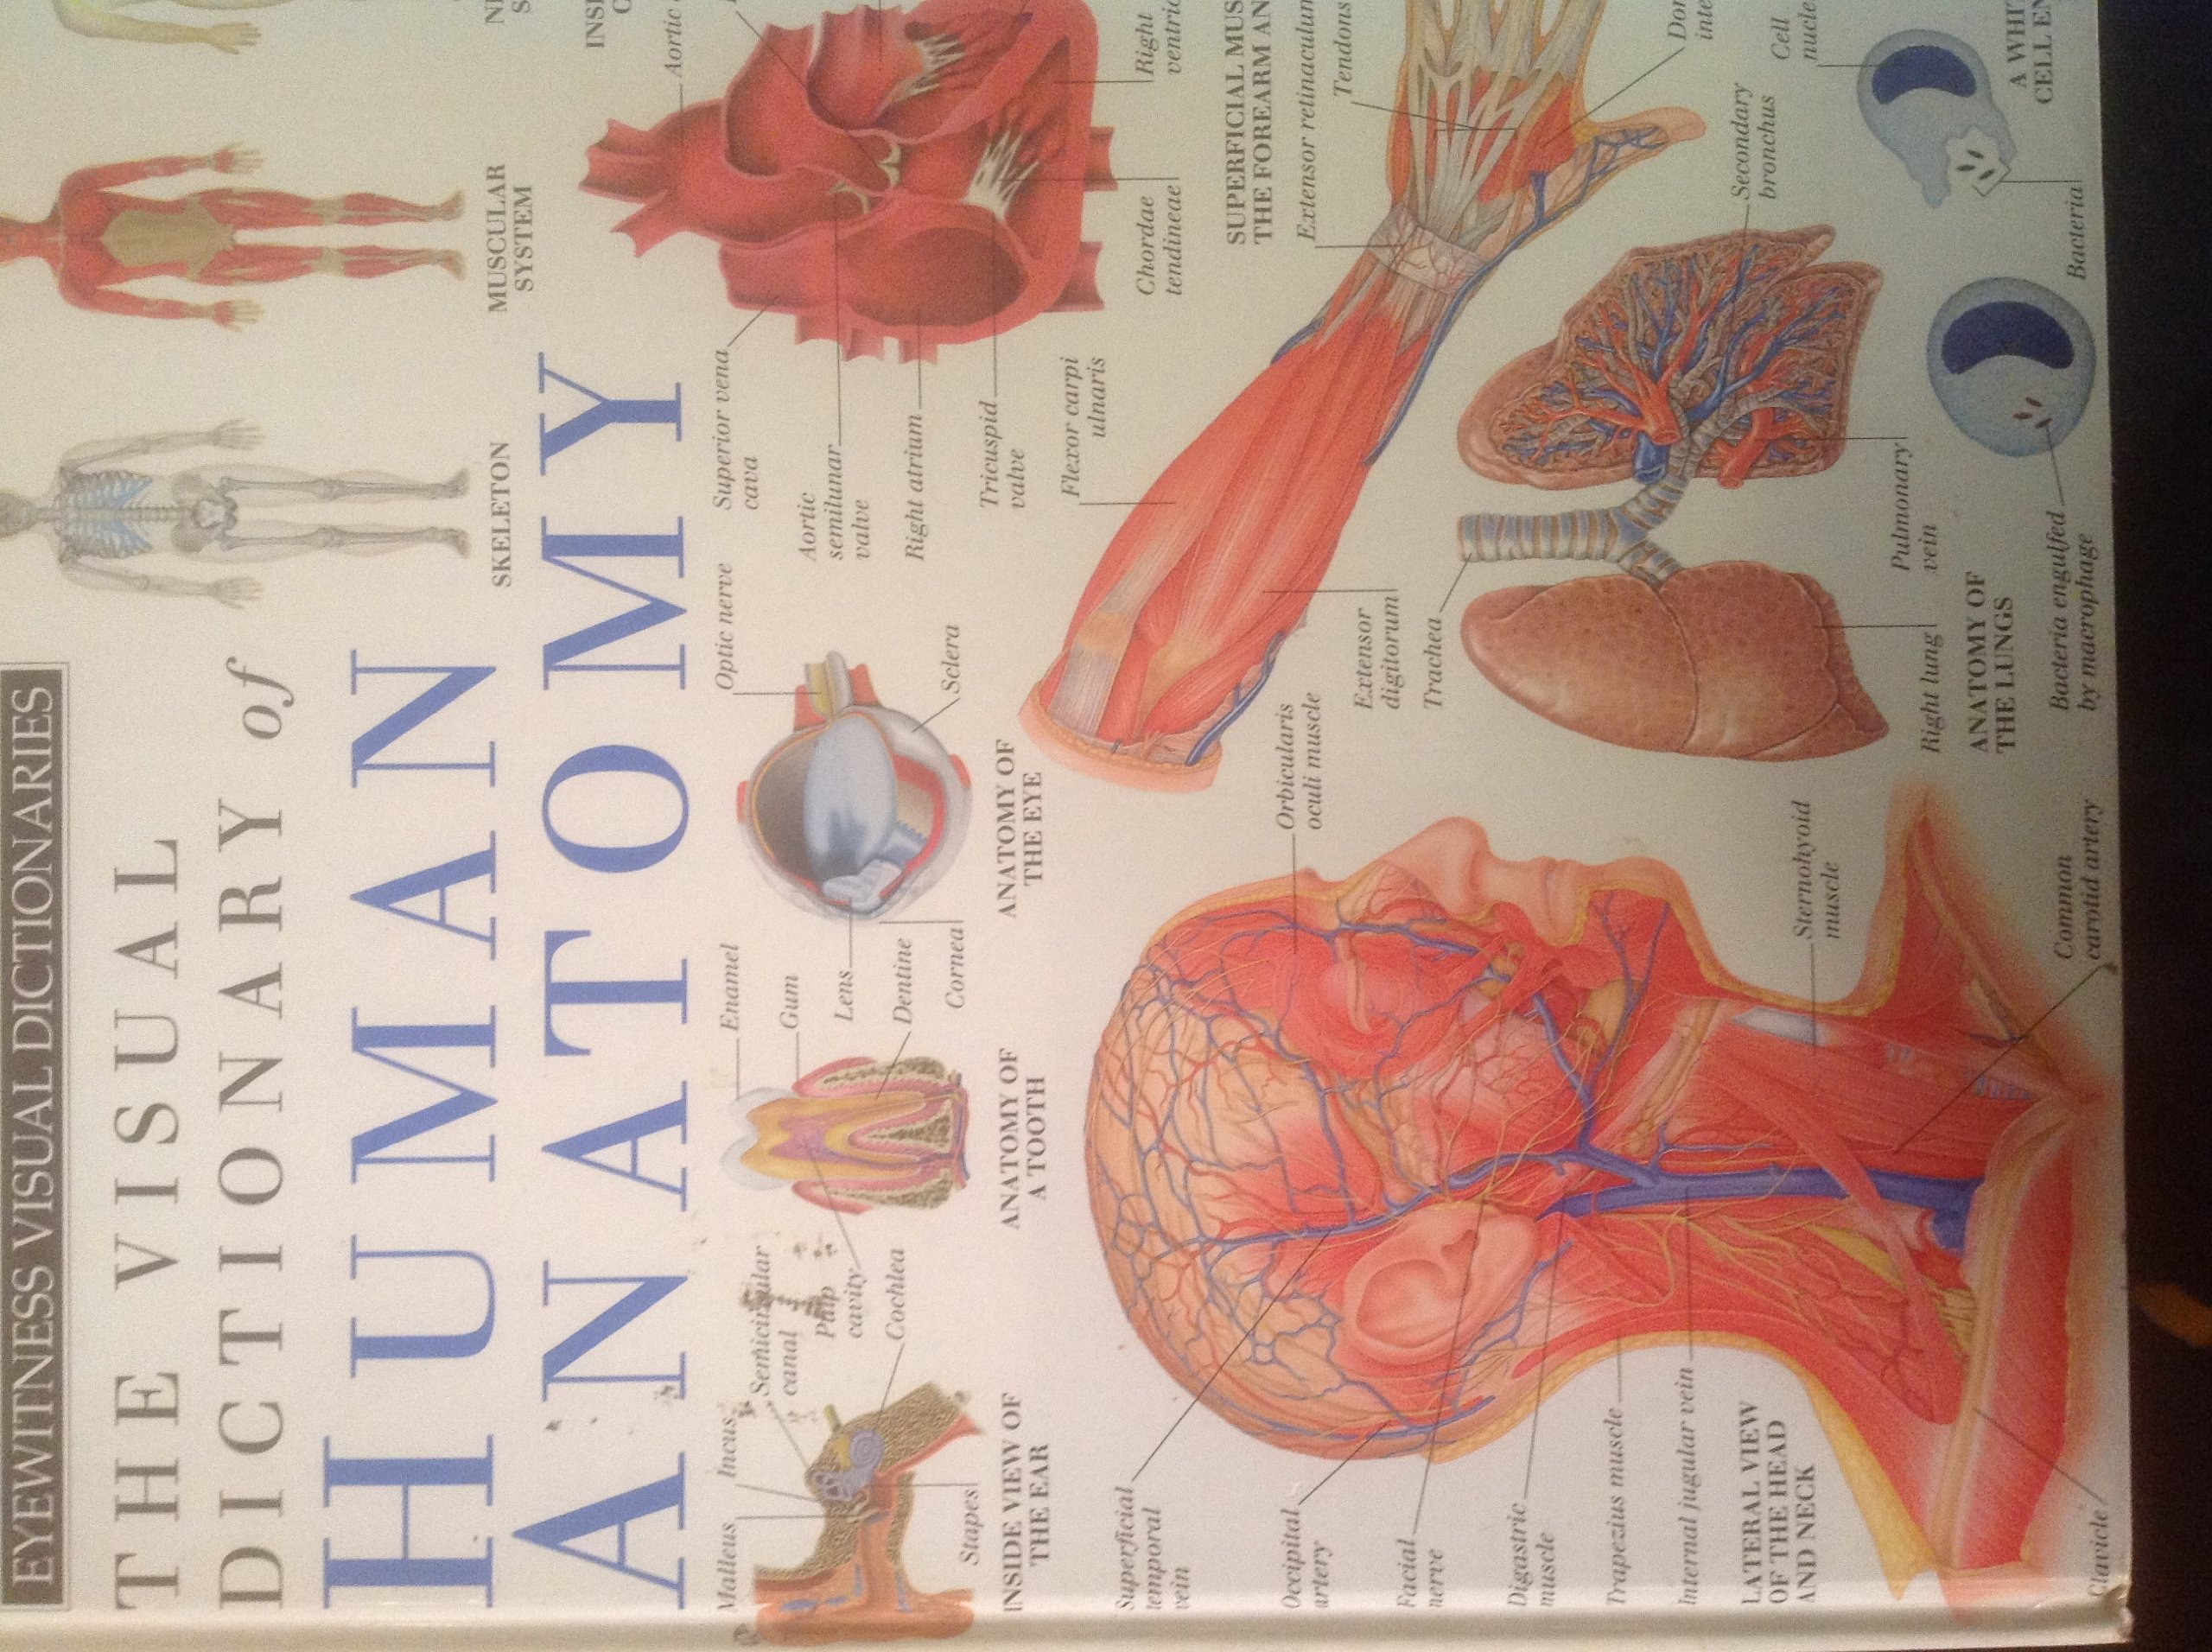 The Visual Dictionary Of Human Anatomy Eyewitness Visual